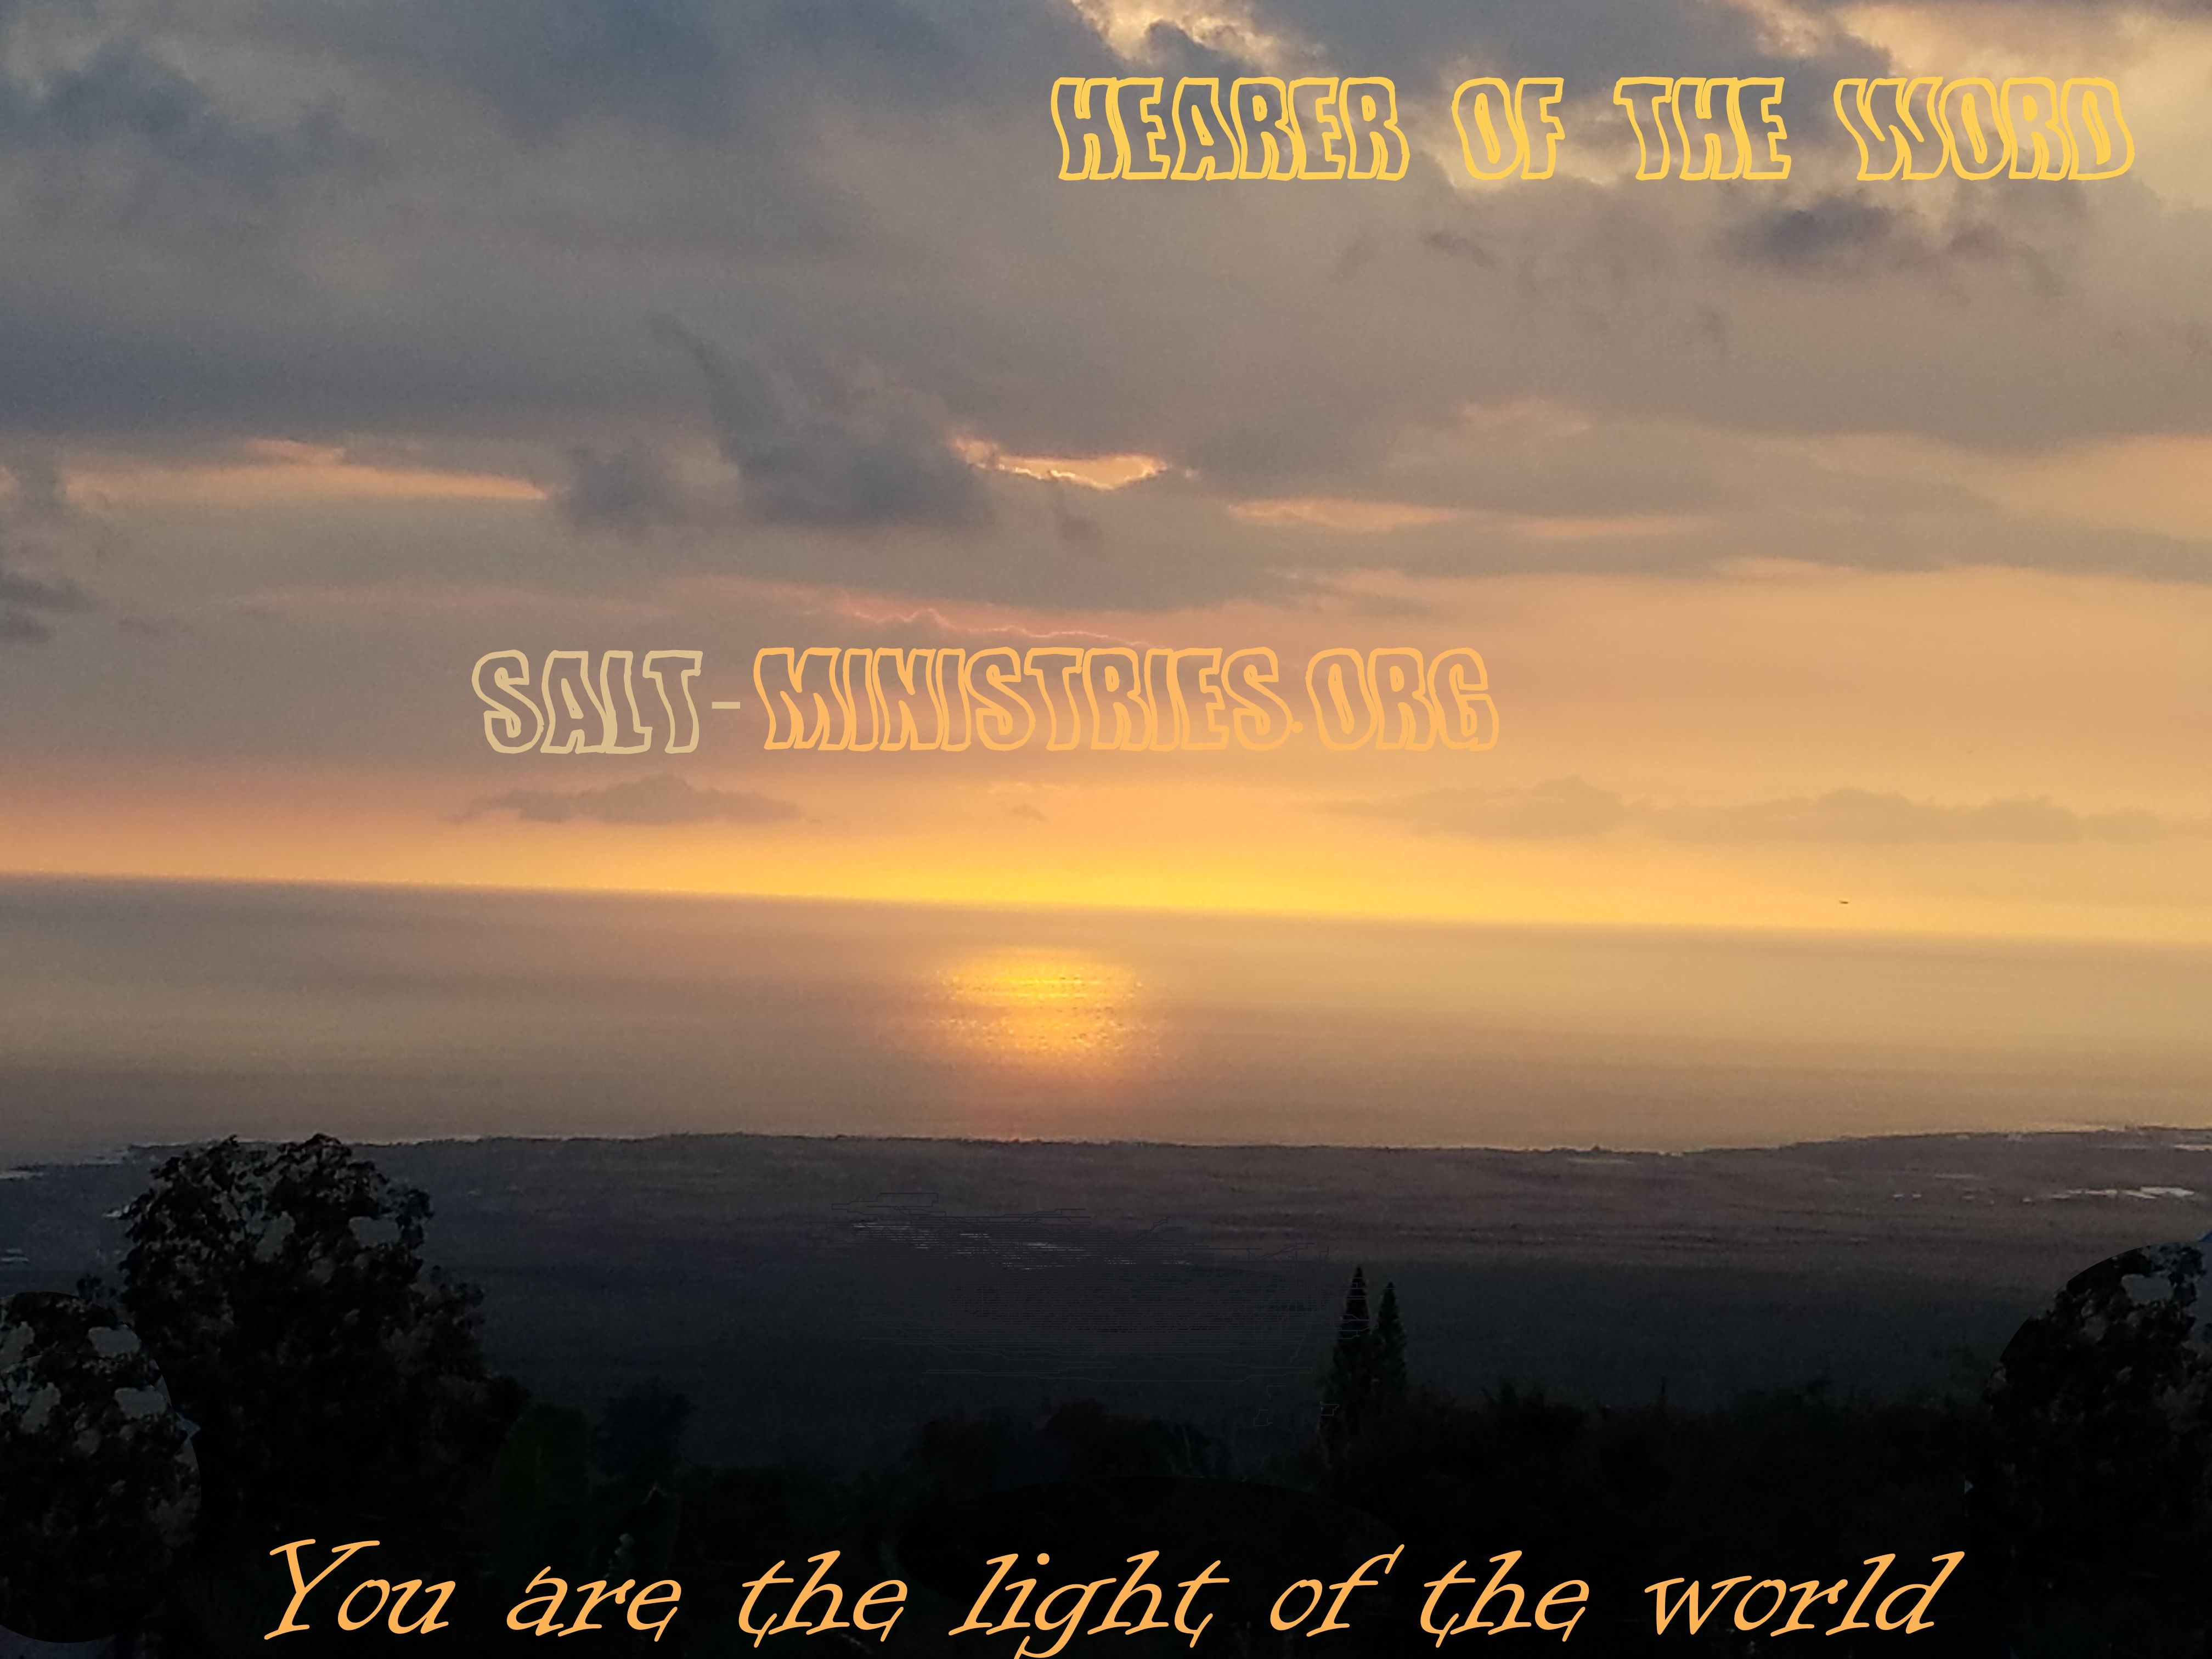 Hearer-of-the-word.jpg (4032×3024)